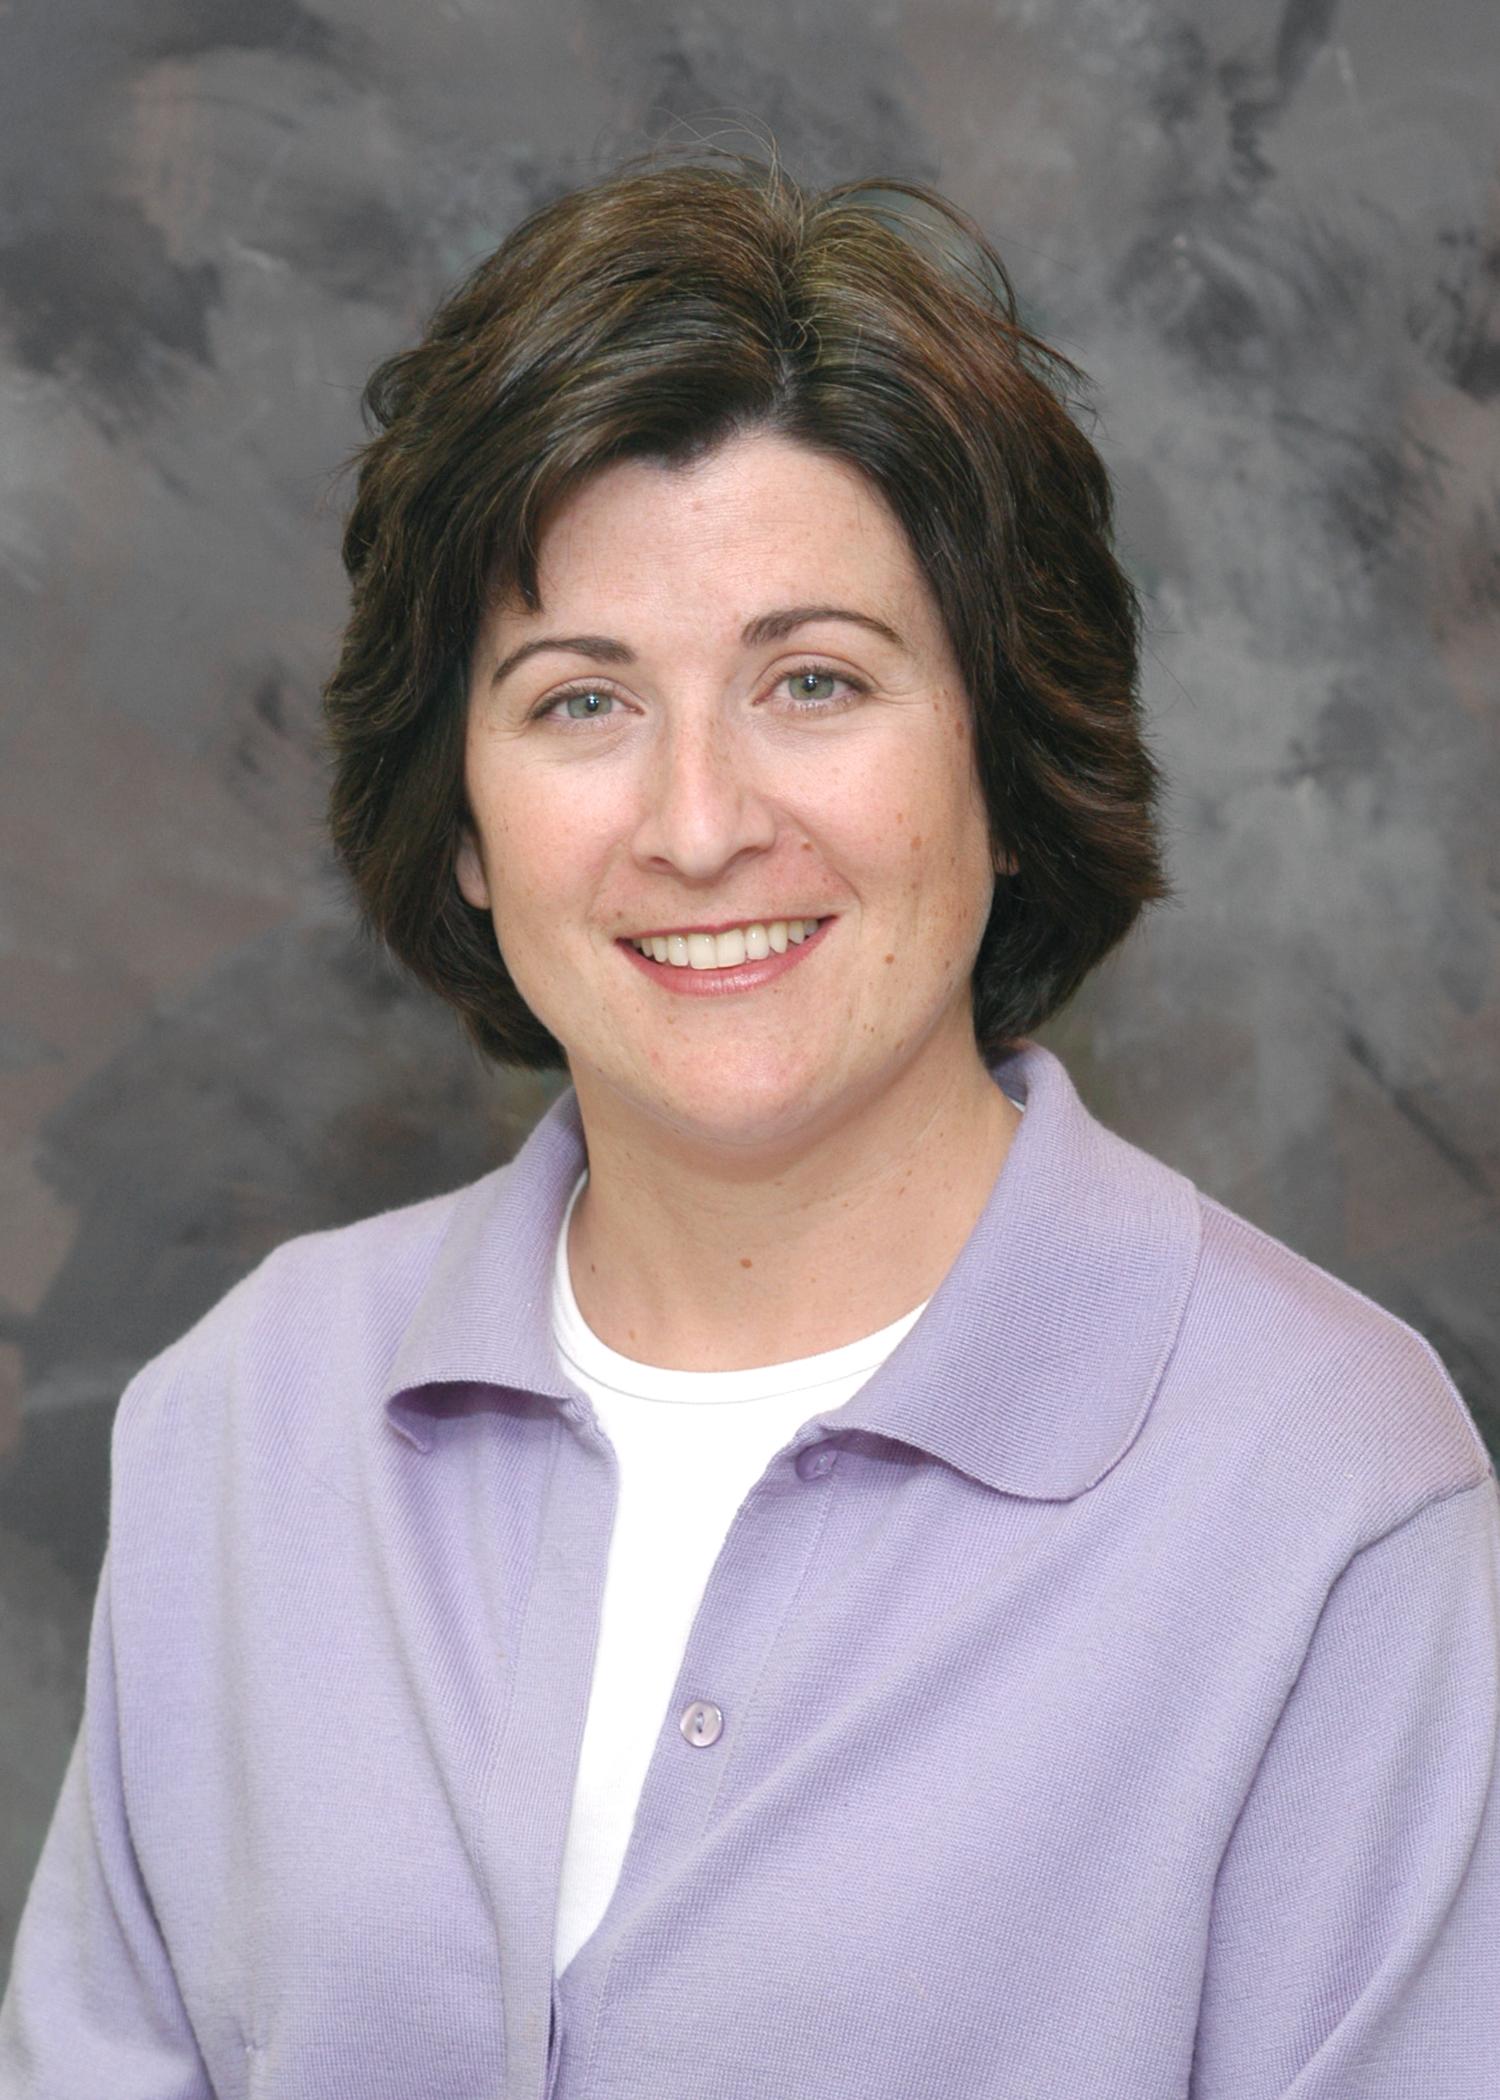 Dr. Margaret Rintamaa